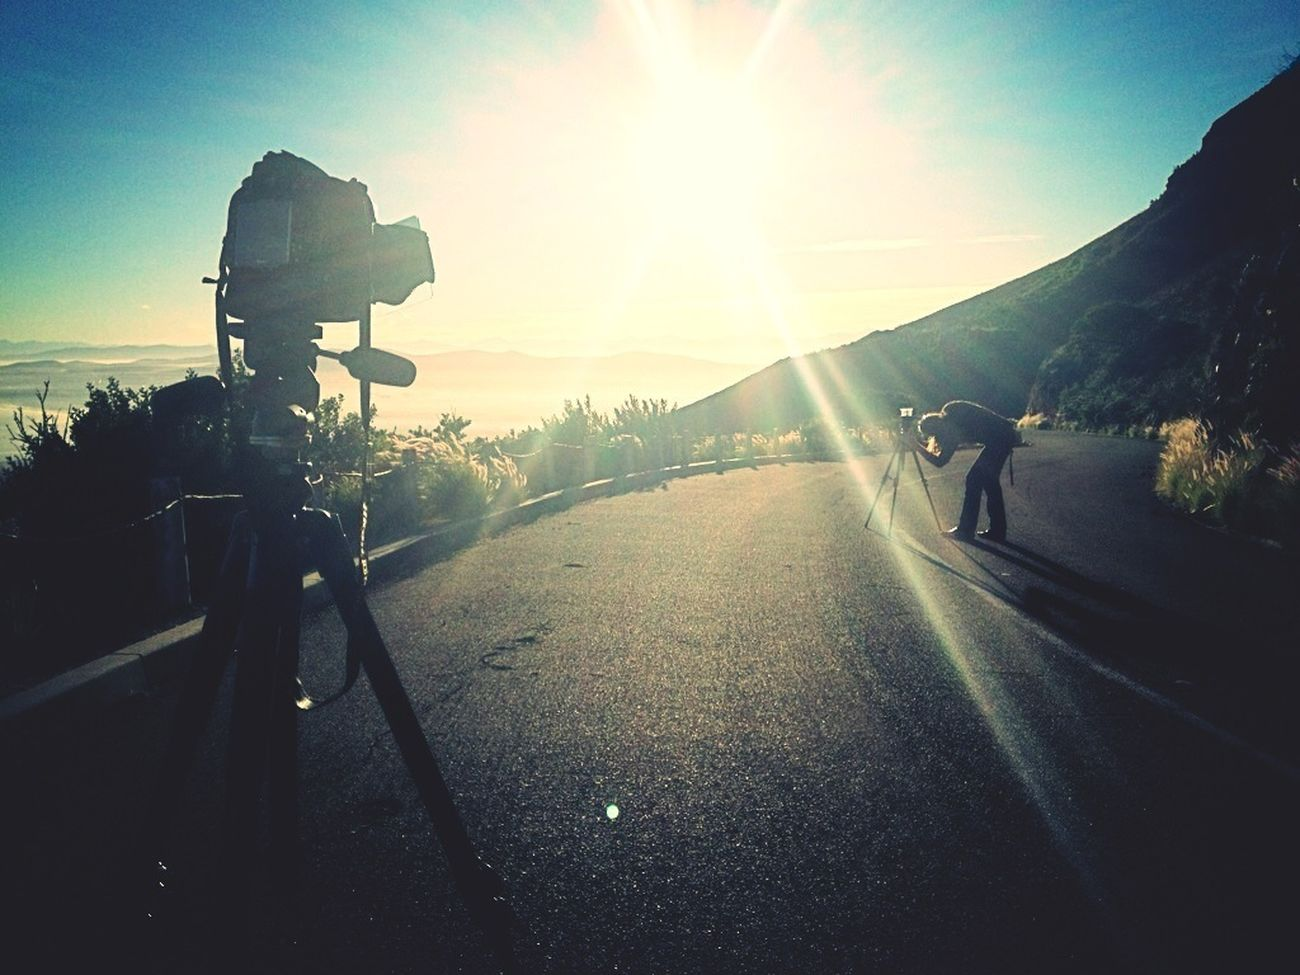 Shooting Cgi